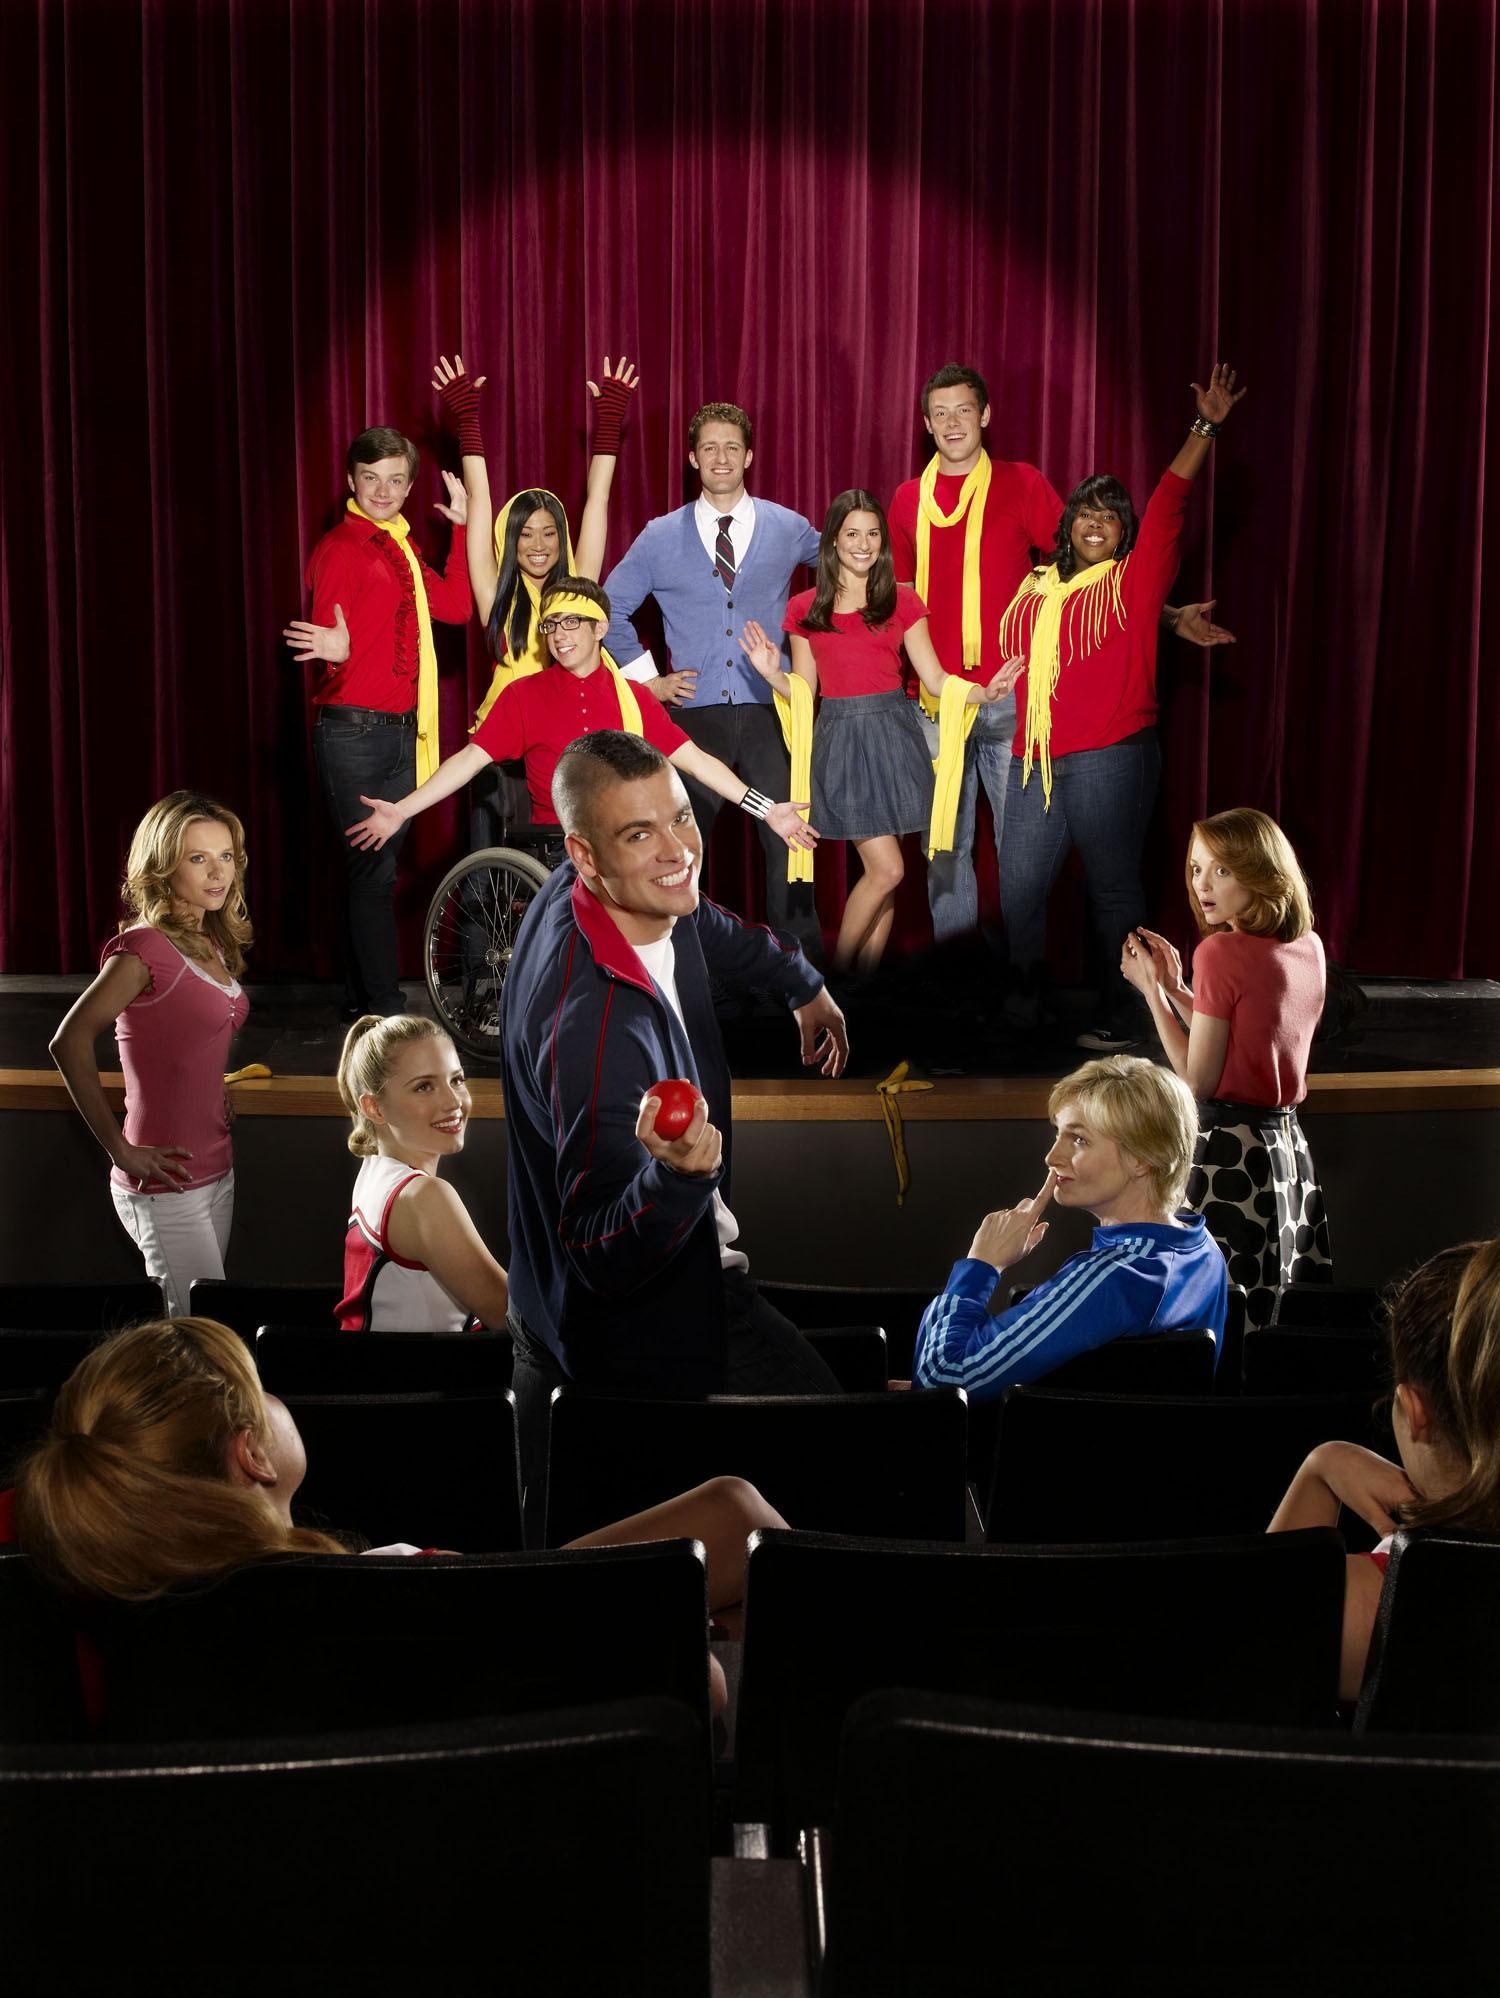 Cory Monteith,Dianna Agron,Jane Lynch,Jayma Mays,Jessalyn Gilsig,Lea Michele,Matthew Morrison